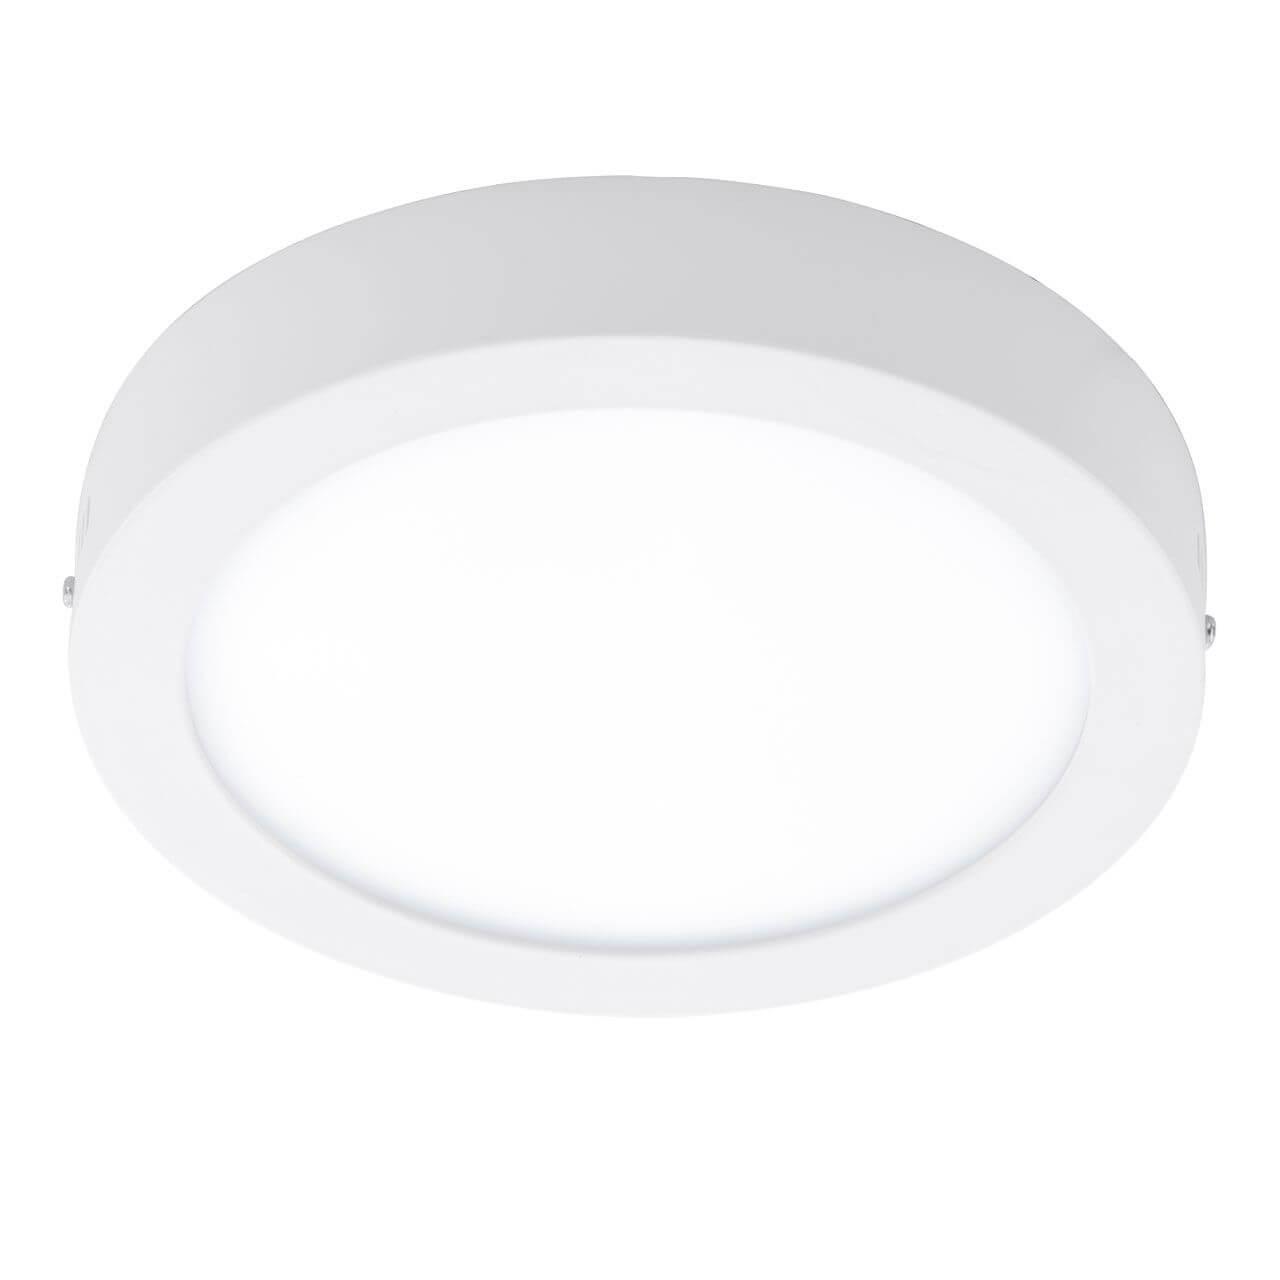 Уличный светильник Eglo 96491, белый eglo tinnari 91635